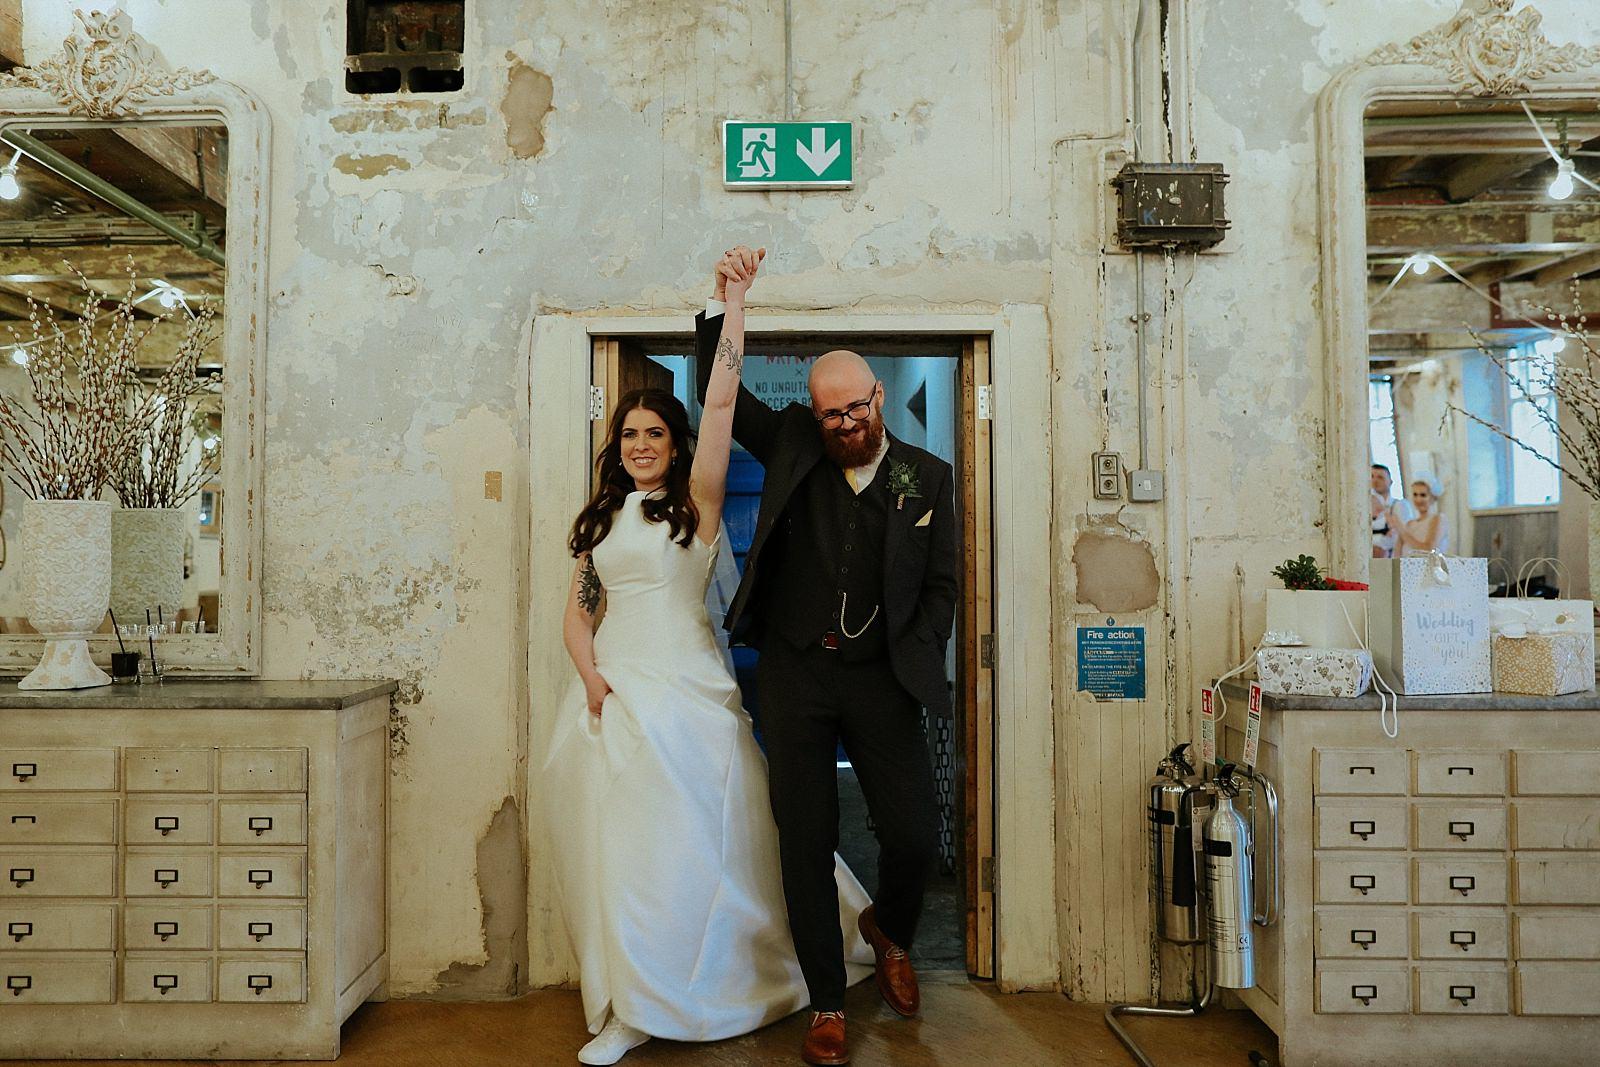 bride and groom entrance to the wedding venue